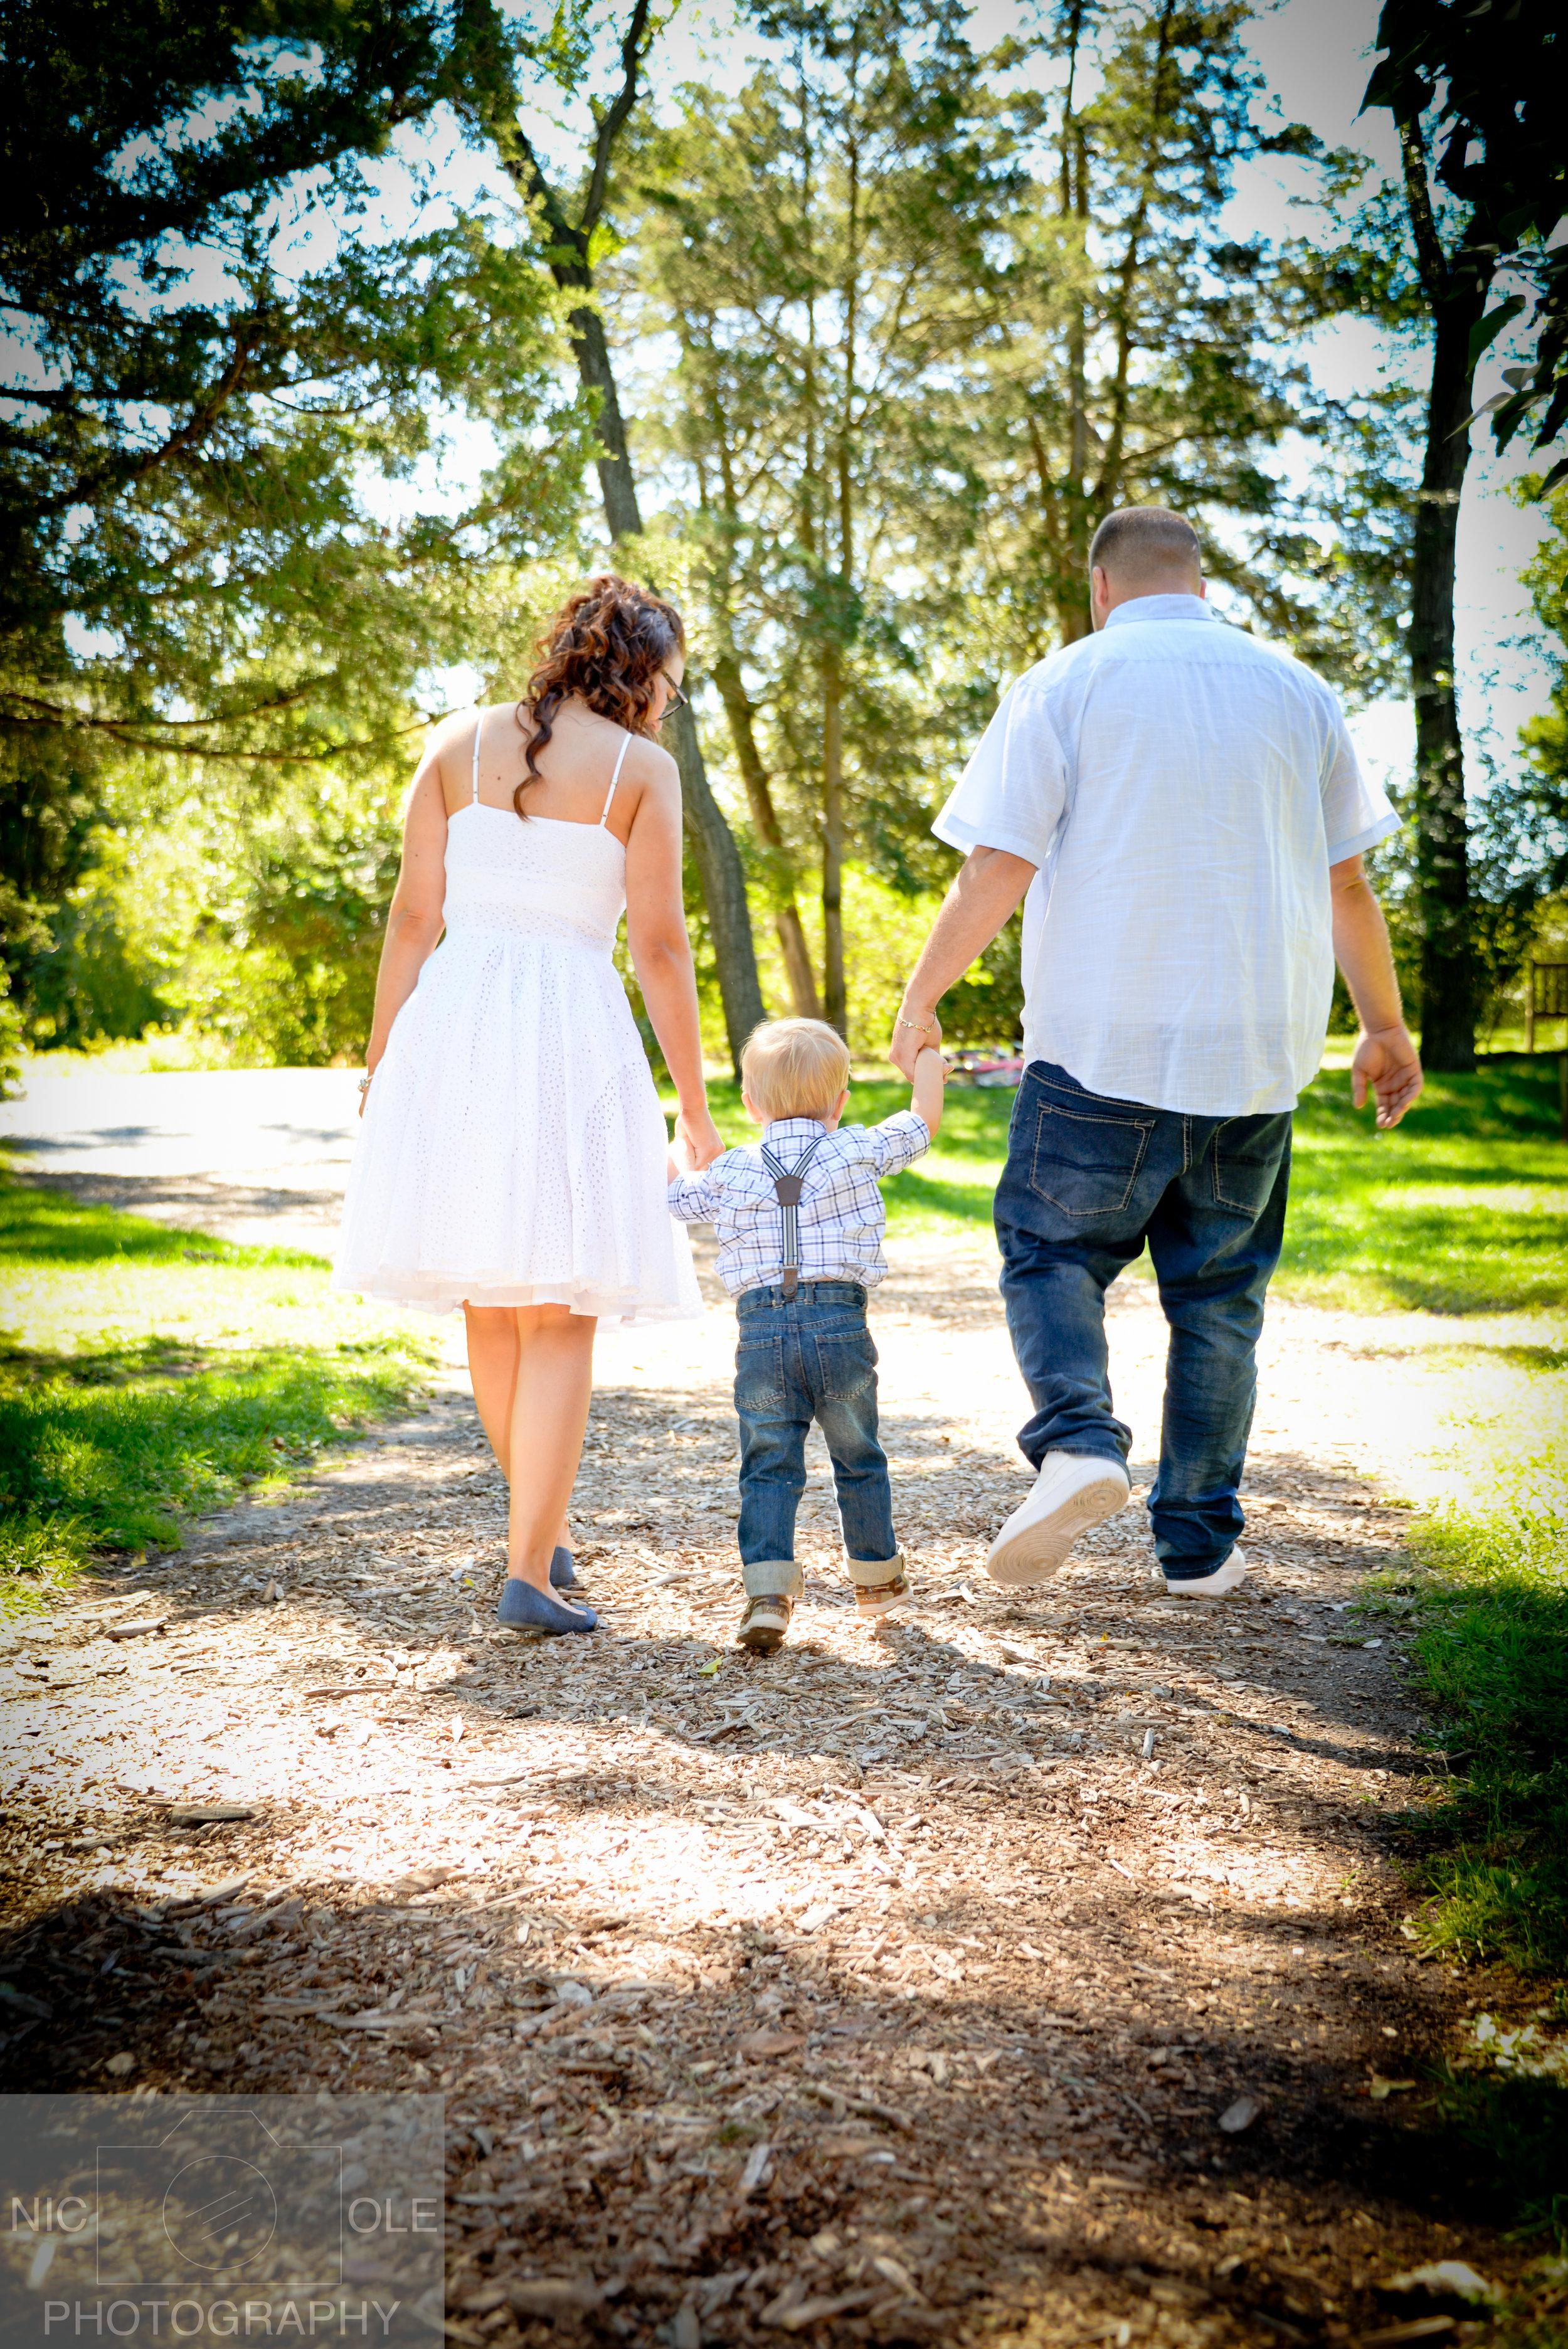 Bremner Family-NIC-OLE Photography-3.jpg